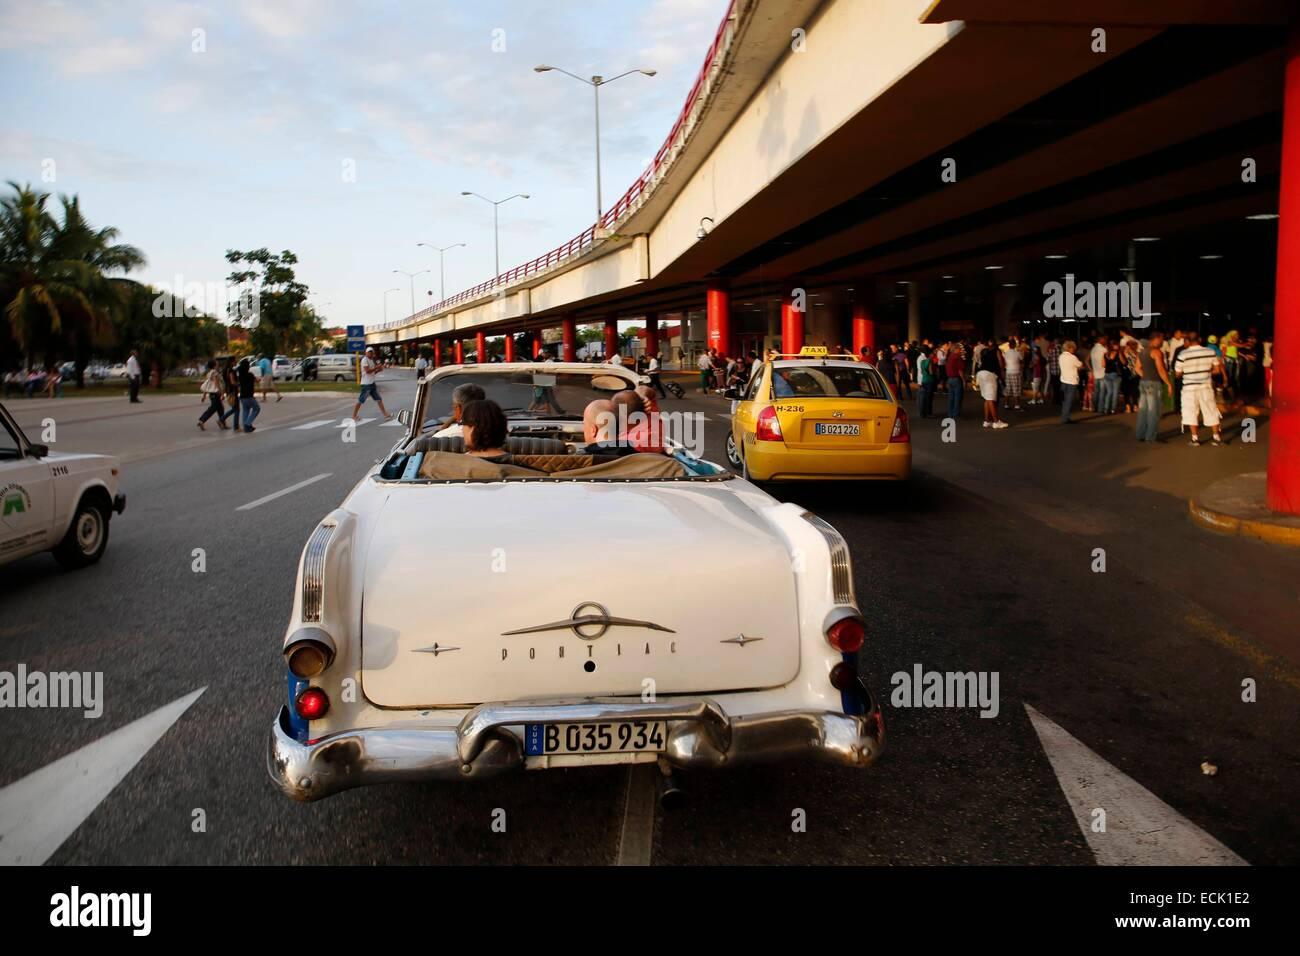 Cuba La Havana Airport Stock Photo 76635610 Alamy